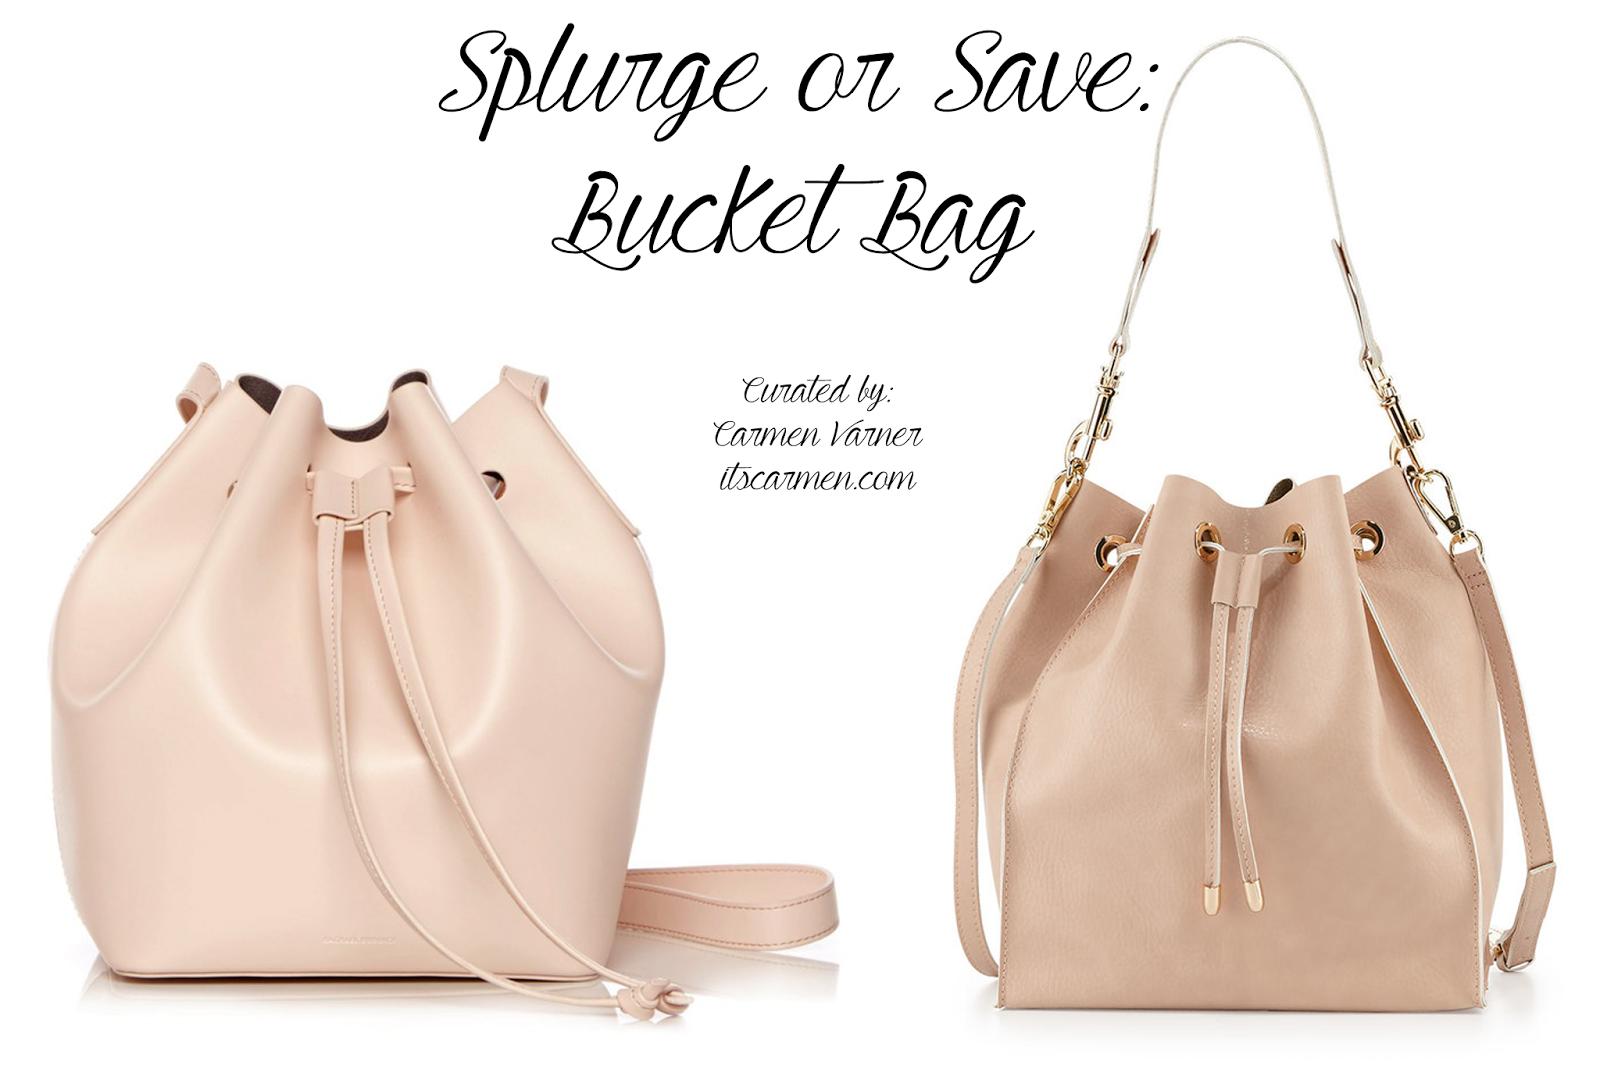 Rachael Ruddick Beach Bucket Bag or Neiman Marcus